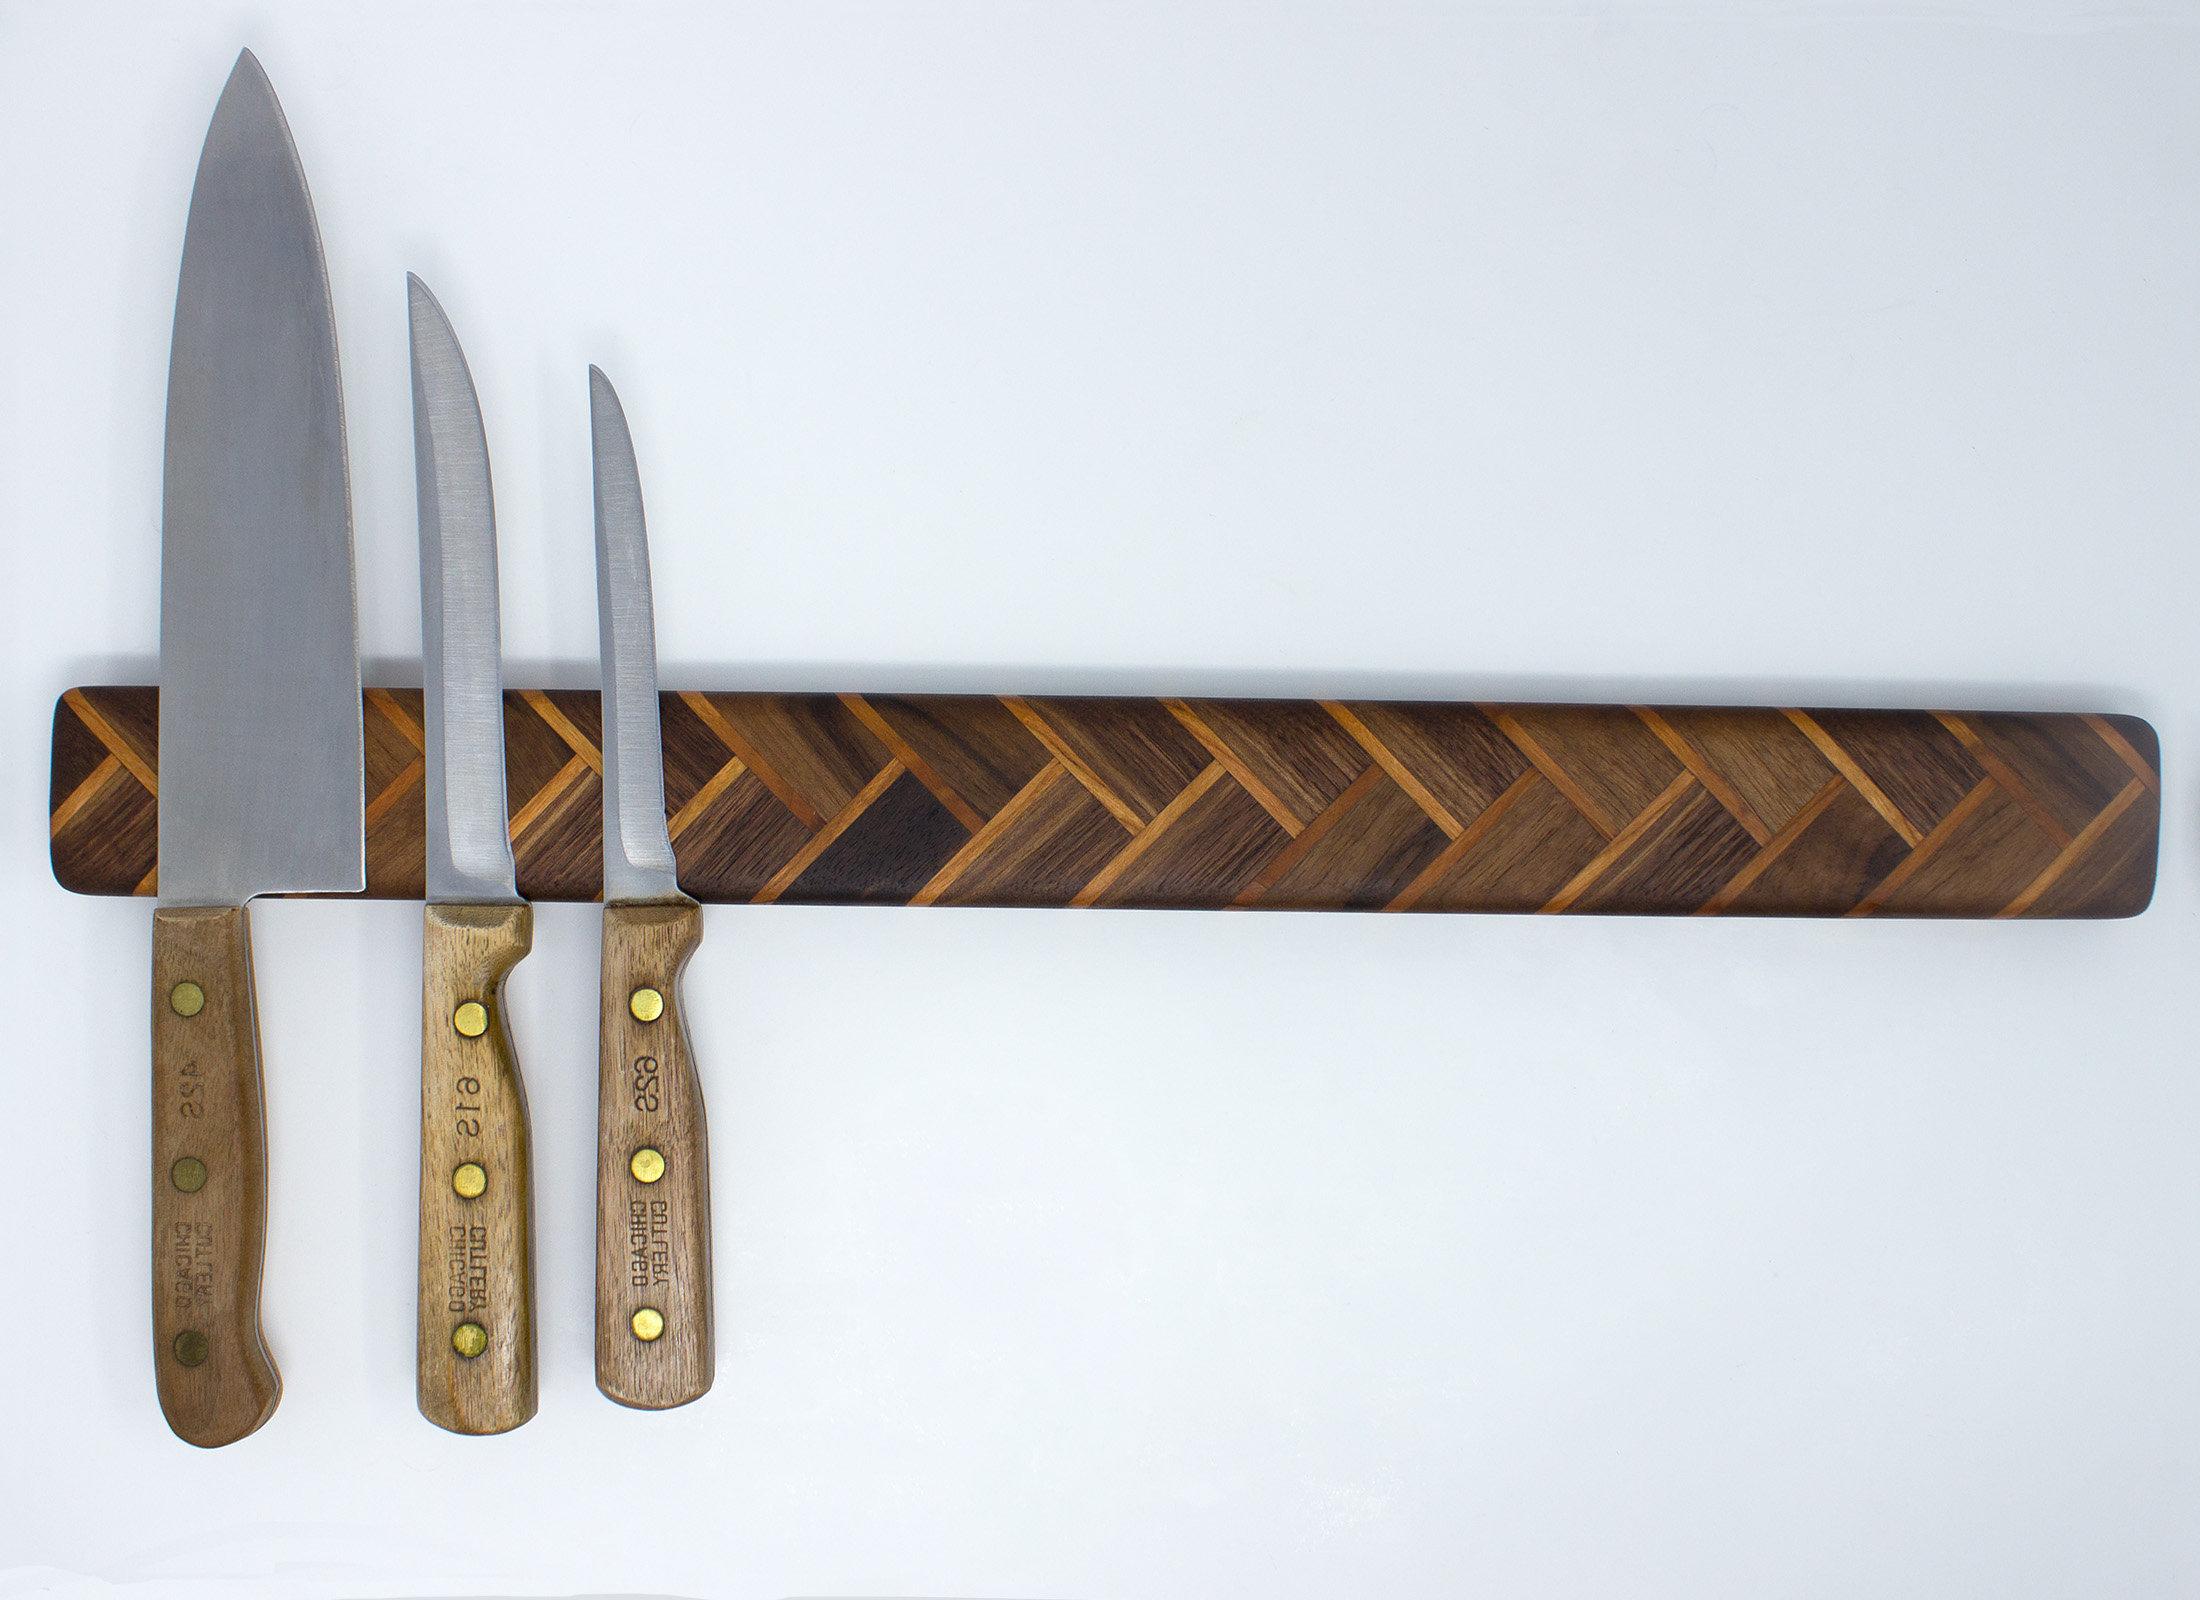 Magnetic Knife